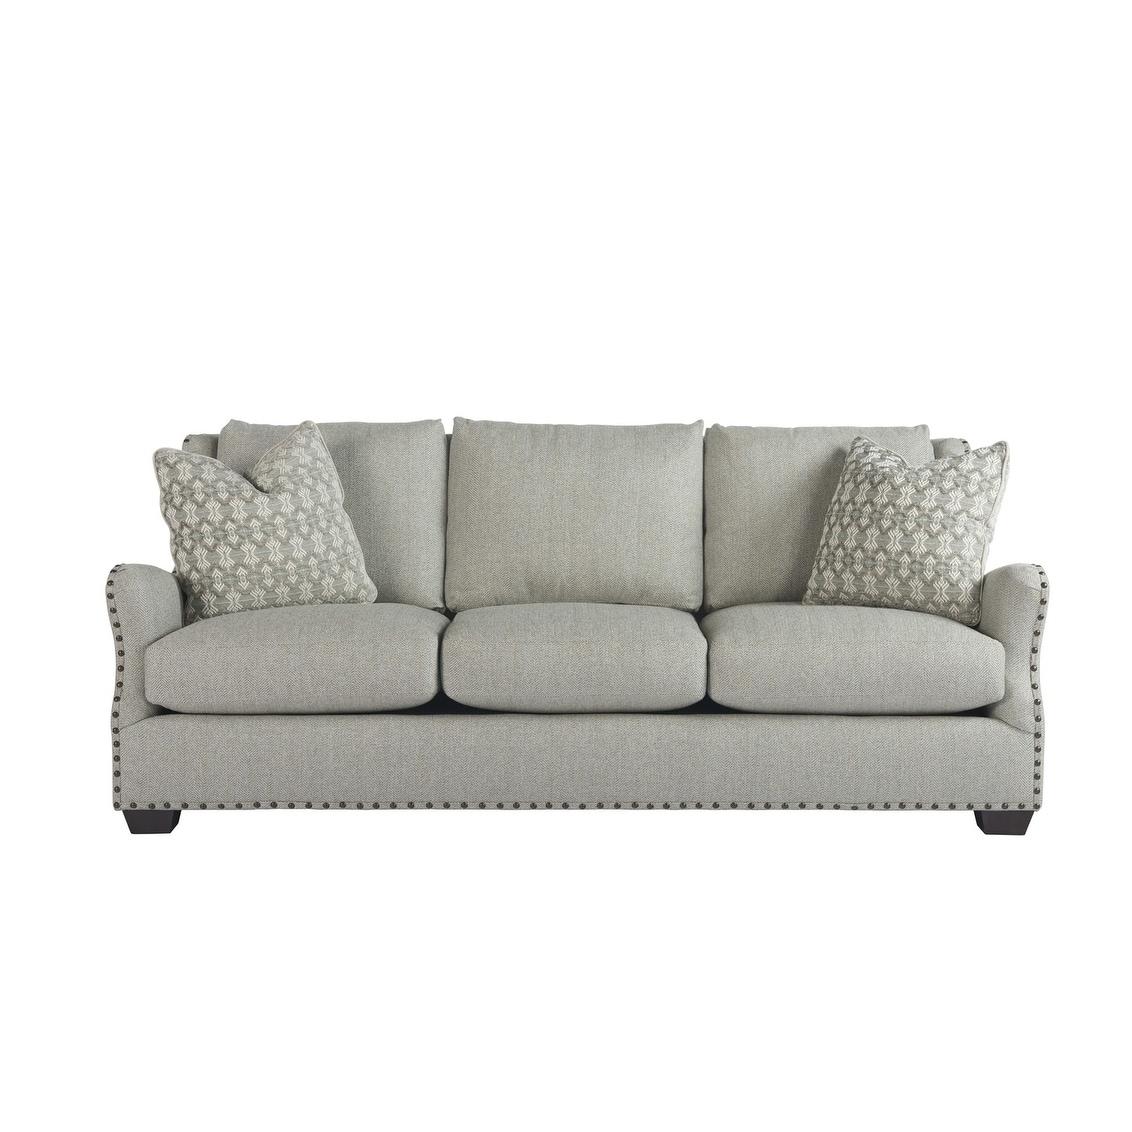 Connor Grey Linen Sofa Free Shipping Today 12792760